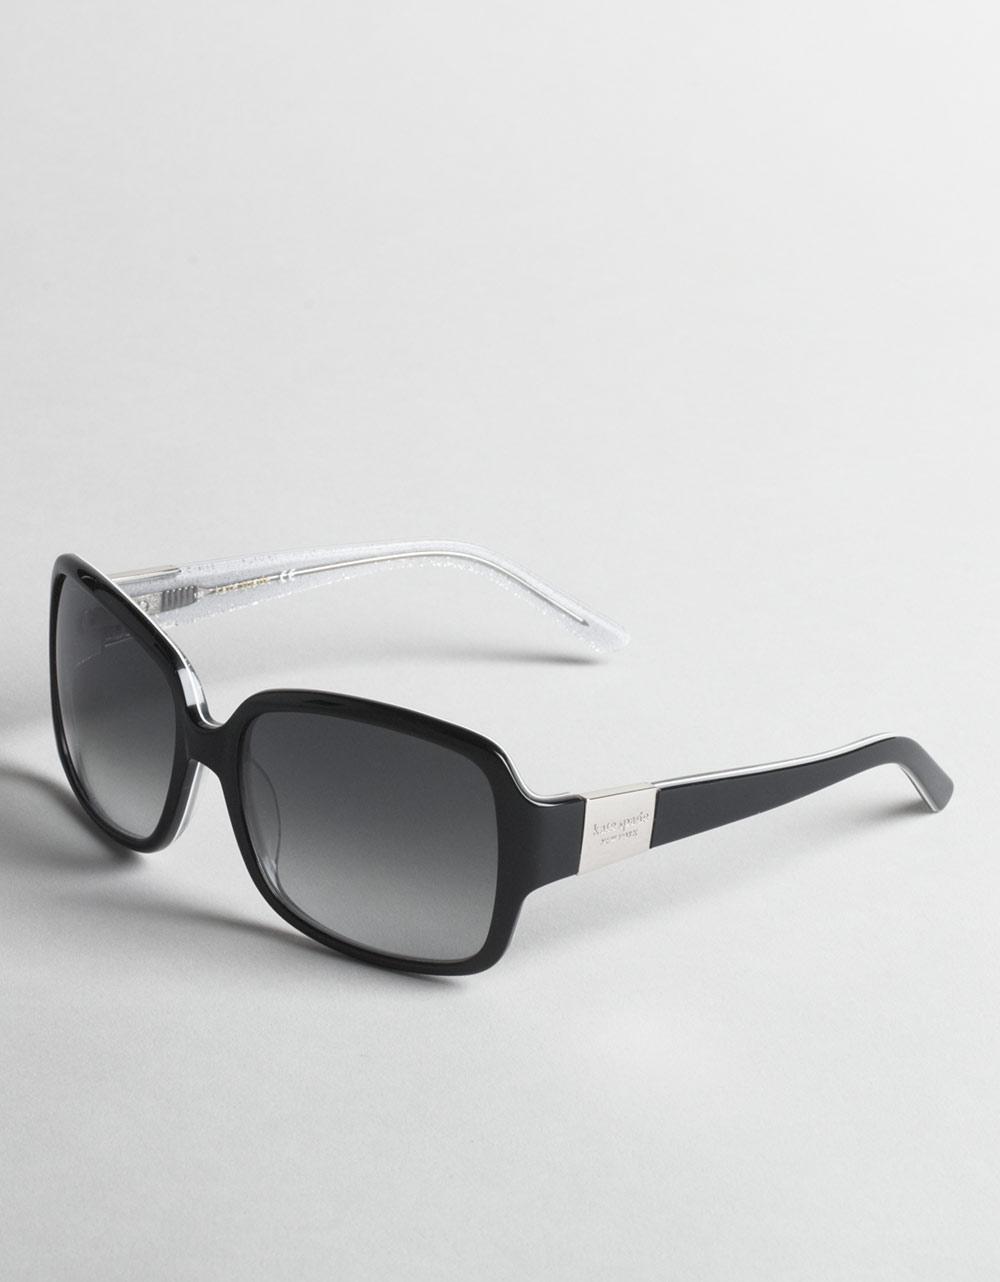 5b5a95b1ea7 Lyst - Kate Spade New York Lulu Oversized Rectangular Sunglasses in ...